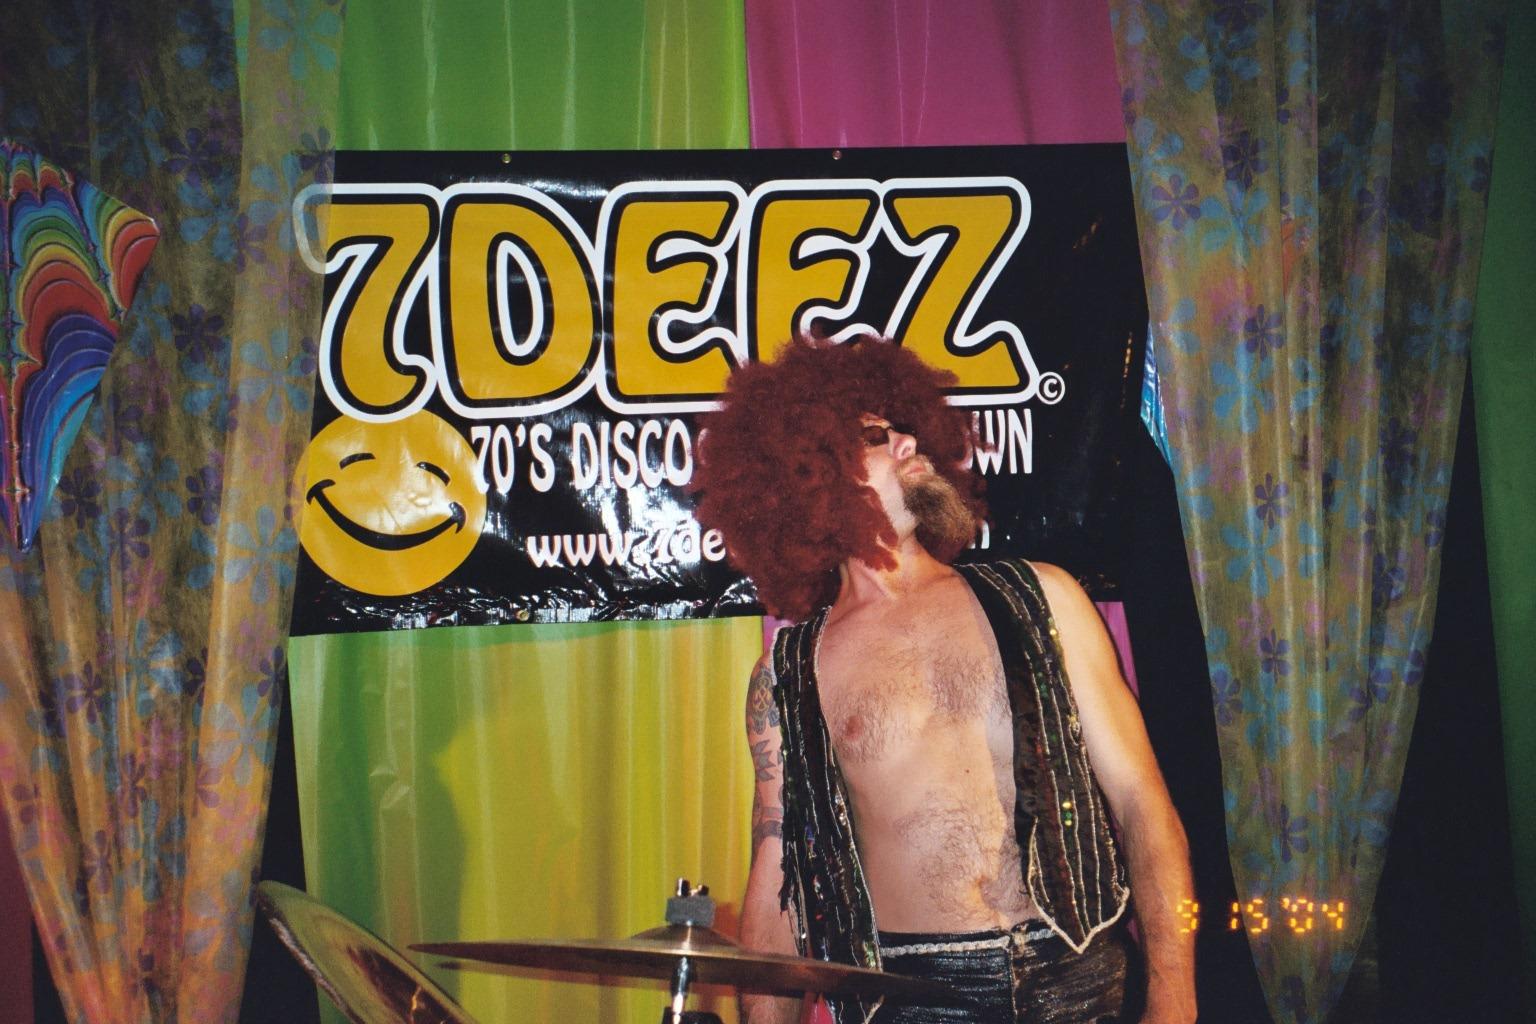 Jimmy Deez